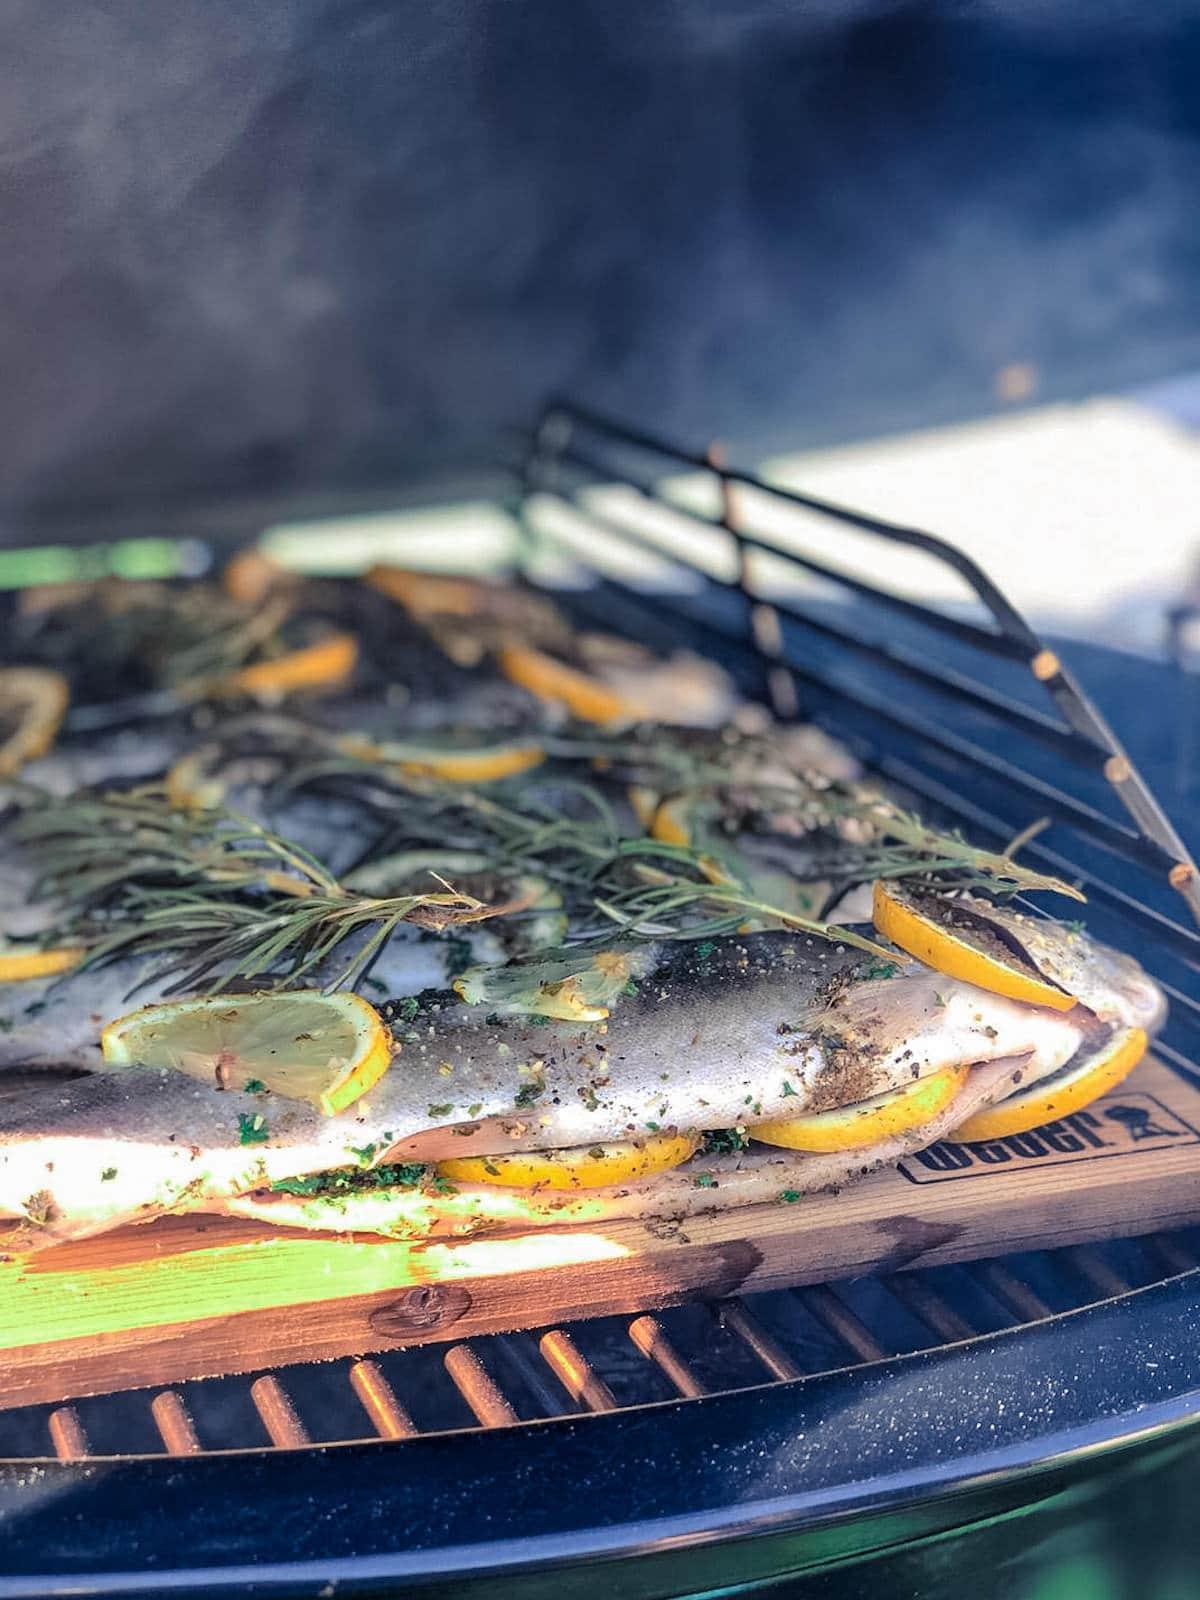 Fisch grillen am Räucherbrett - es geht auch ganz ohne Alufolie  - entgegen der ganzen Grill-Mythen